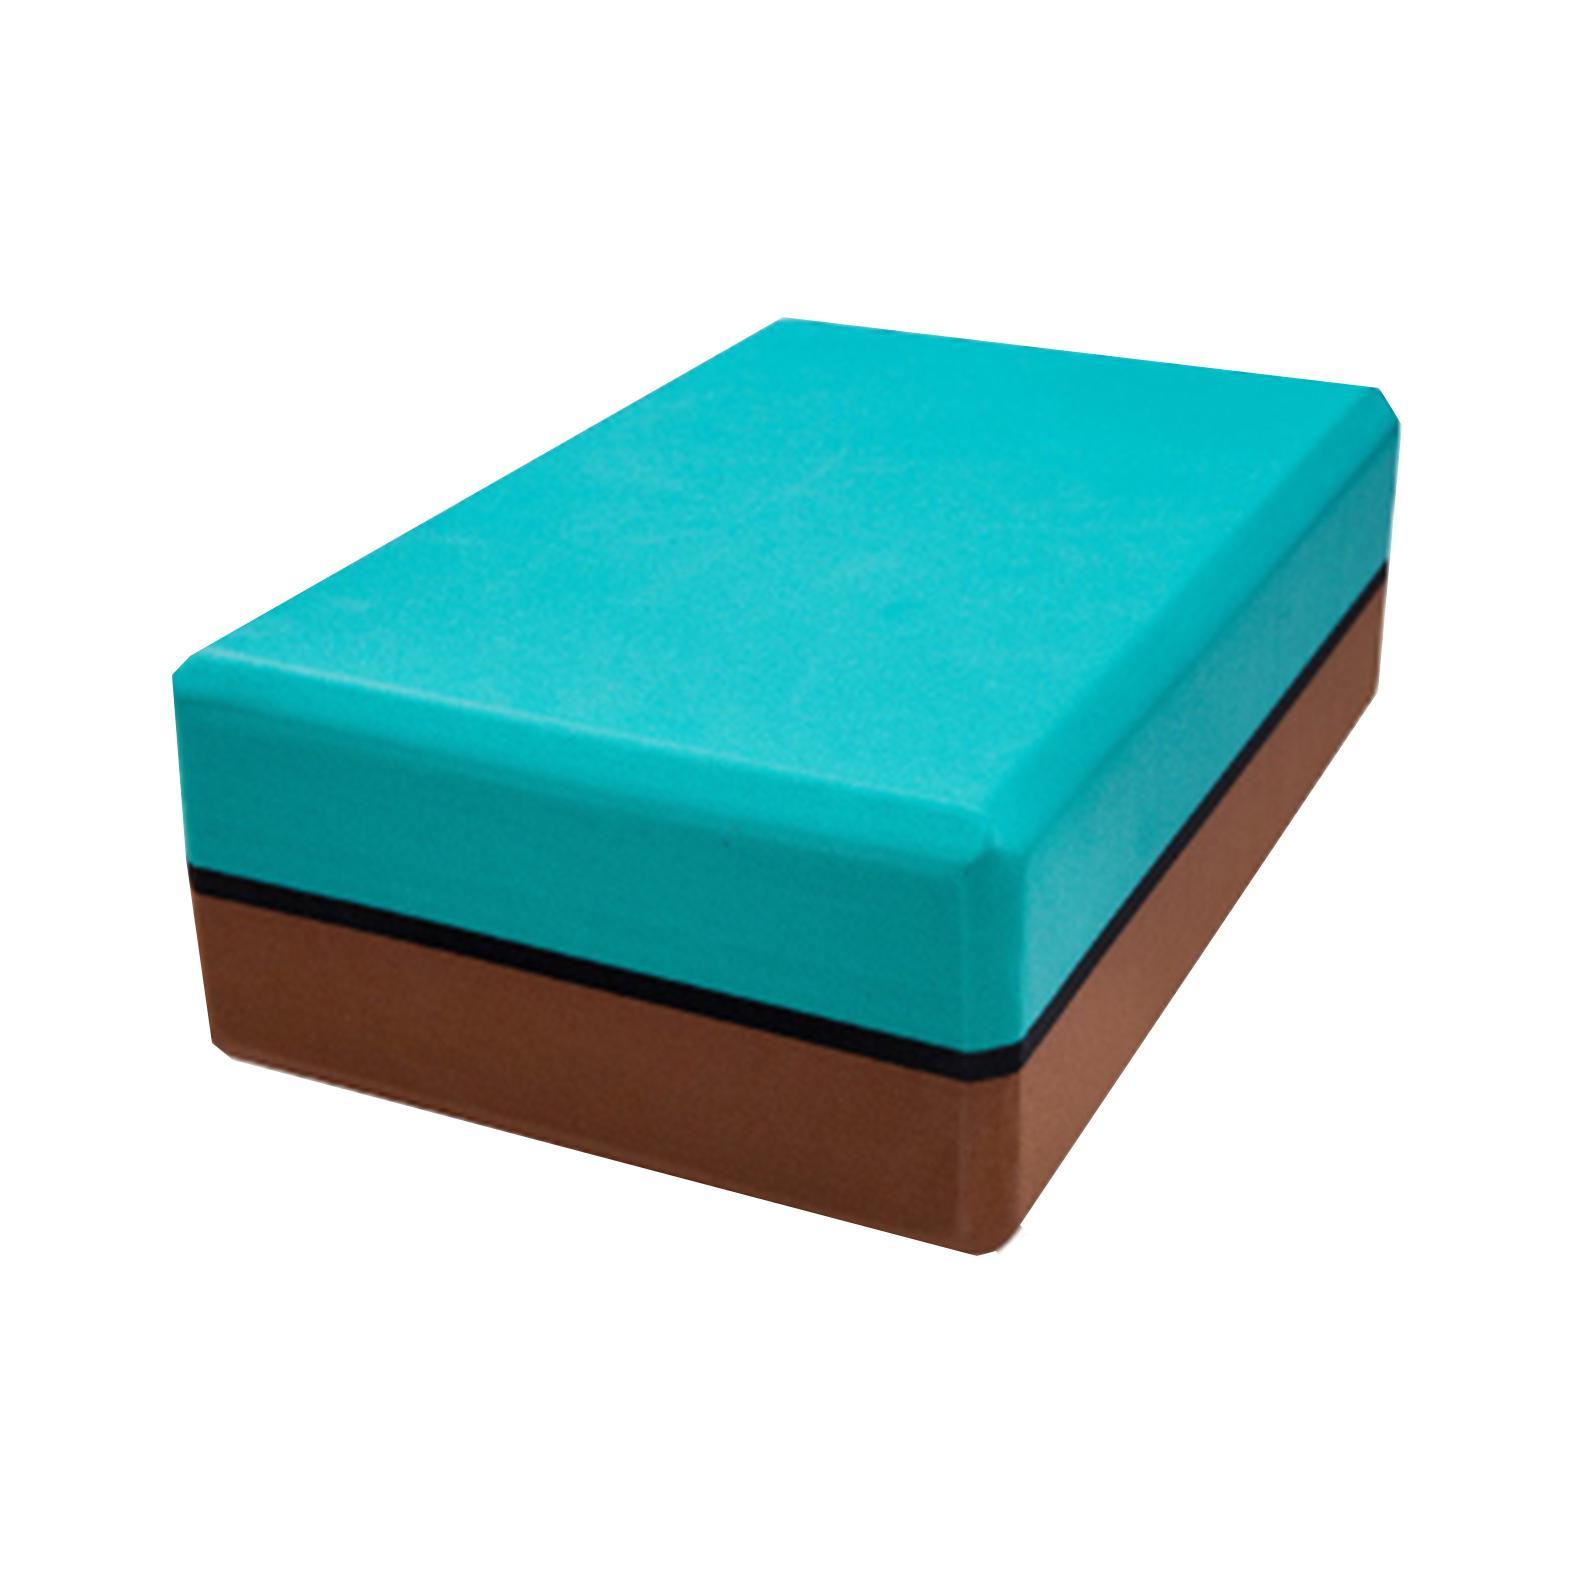 Jiji Premium Dual Color Yoga Block 3 Inch (yoga / Blocks) - High Density Eva Foam/ Yoga Aerobic Pilates Foam Block Brick Home Exercise Fitness (sg) By Jiji Sports.